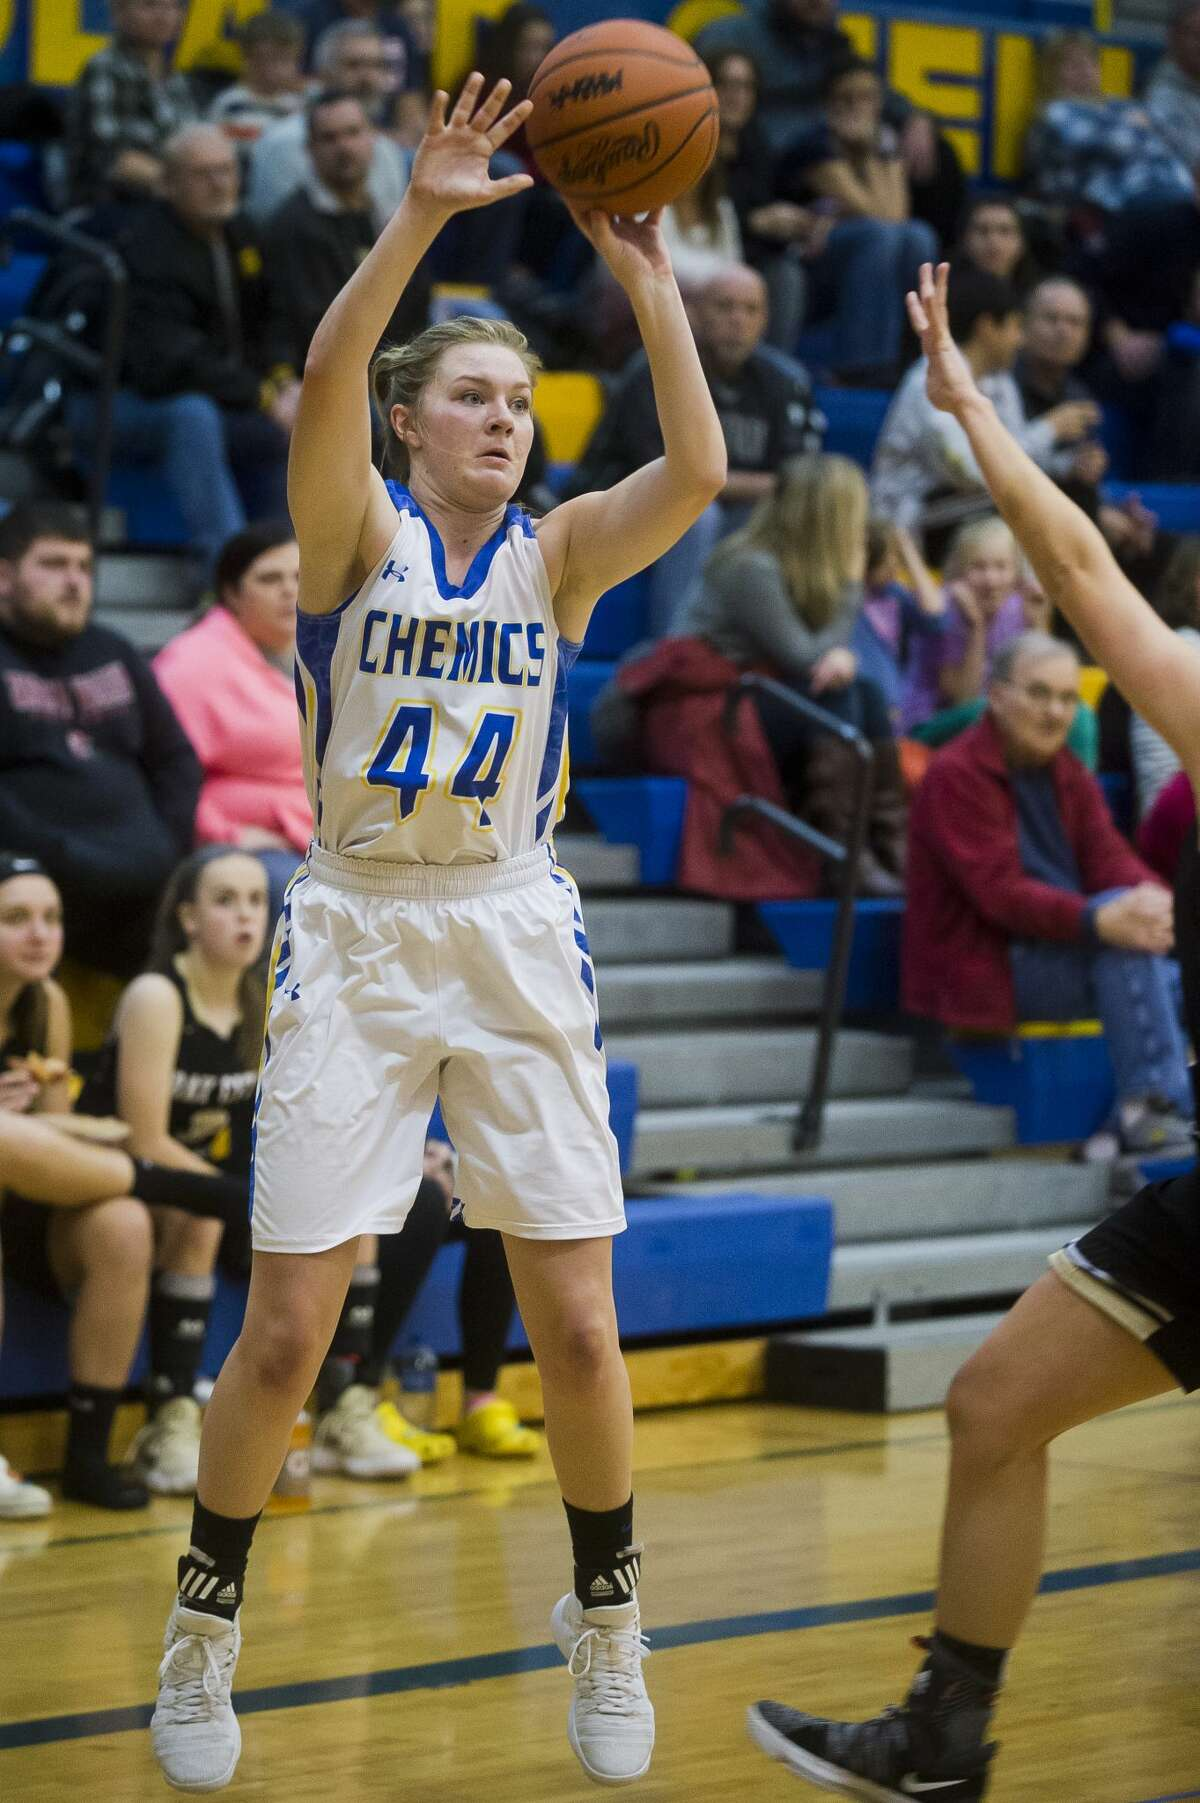 Midland senior Maddie Barrie takes a shot during a game against Bay City Western on Friday, Dec. 8, 2017 at Midland High School. (Katy Kildee/kkildee@mdn.net)